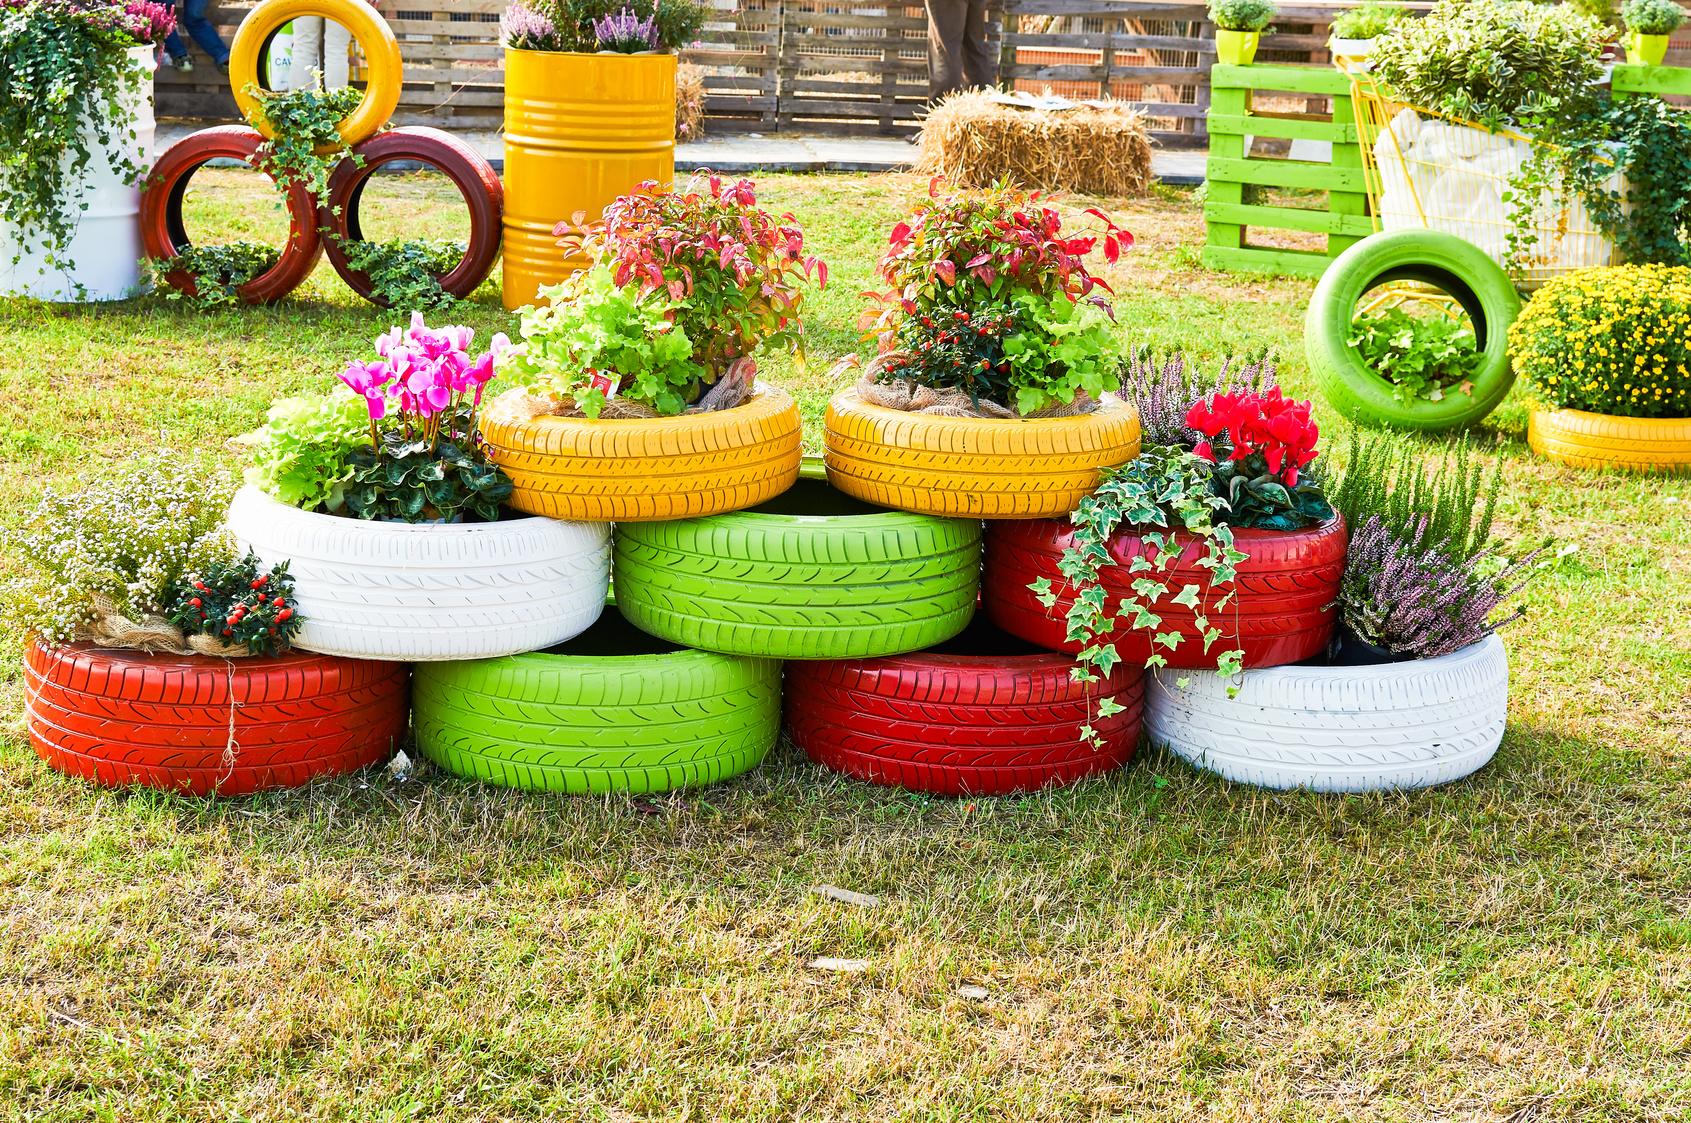 Recicla en casa con upcycling